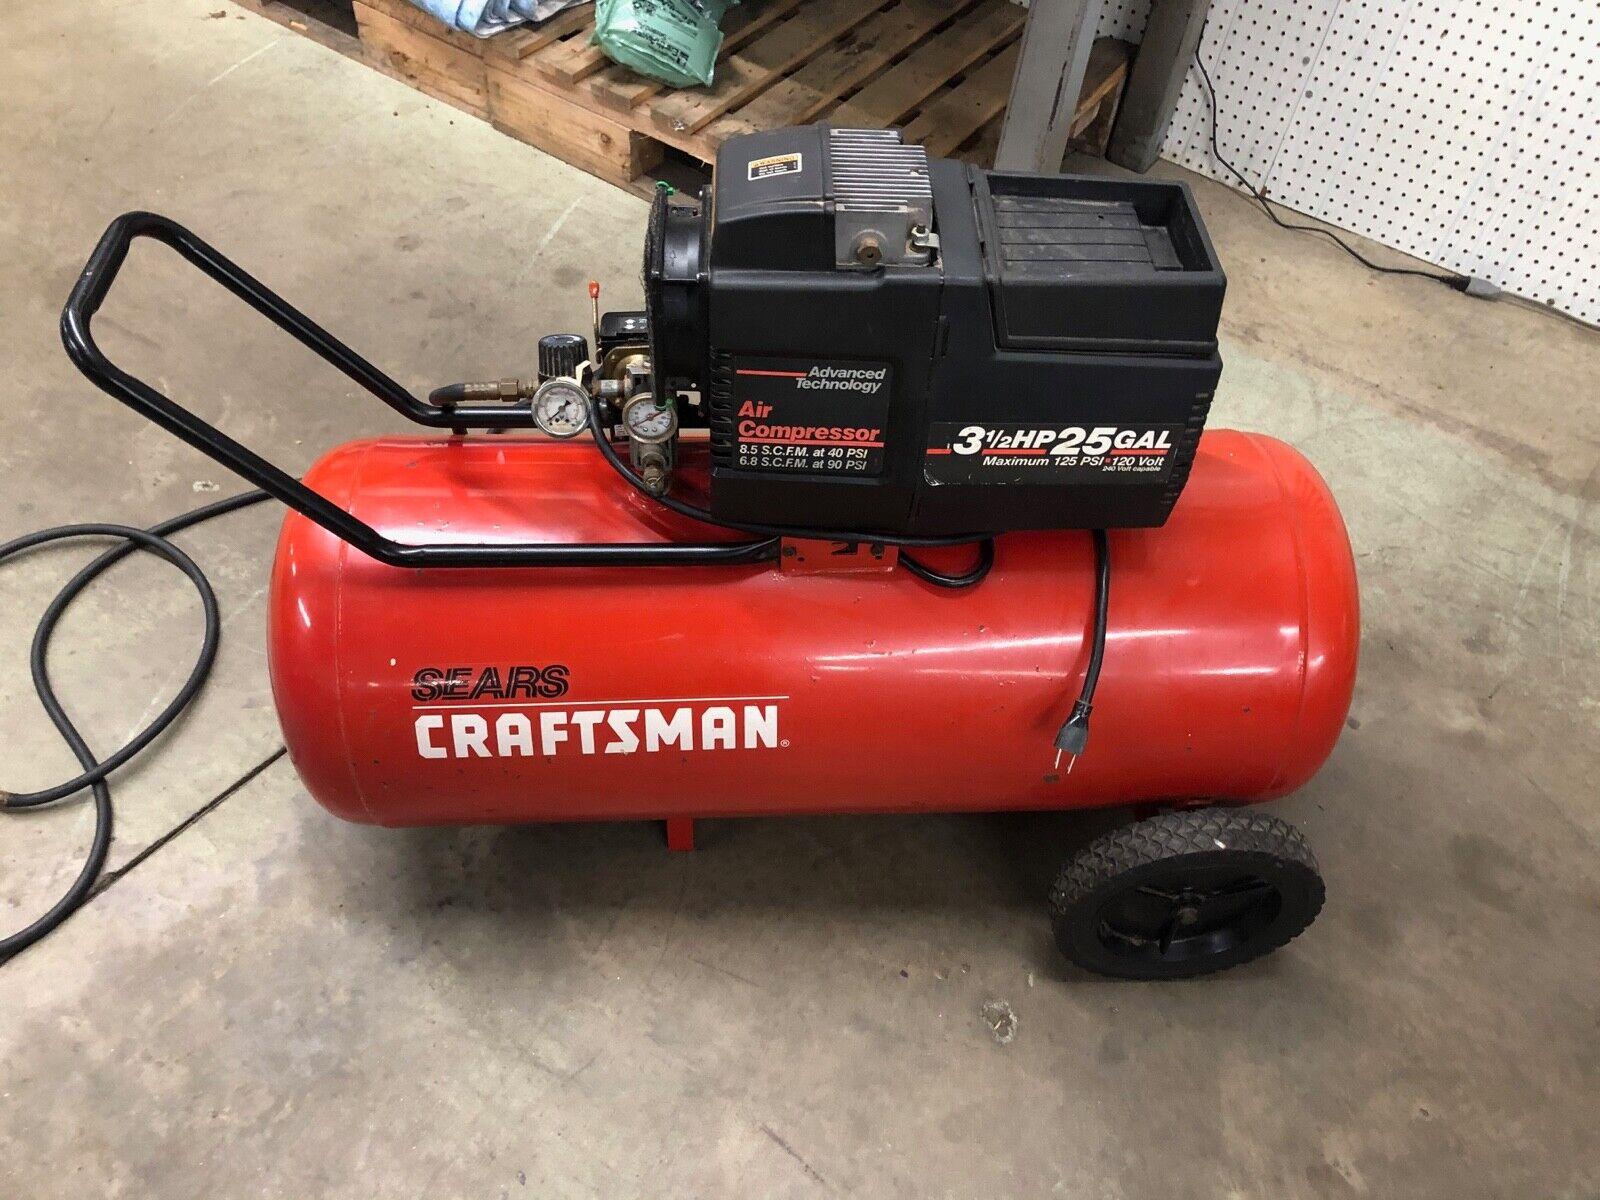 Sears Craftsman 919 155732 3 5hp 25 Gallon Air Compressor For Sale Online Ebay